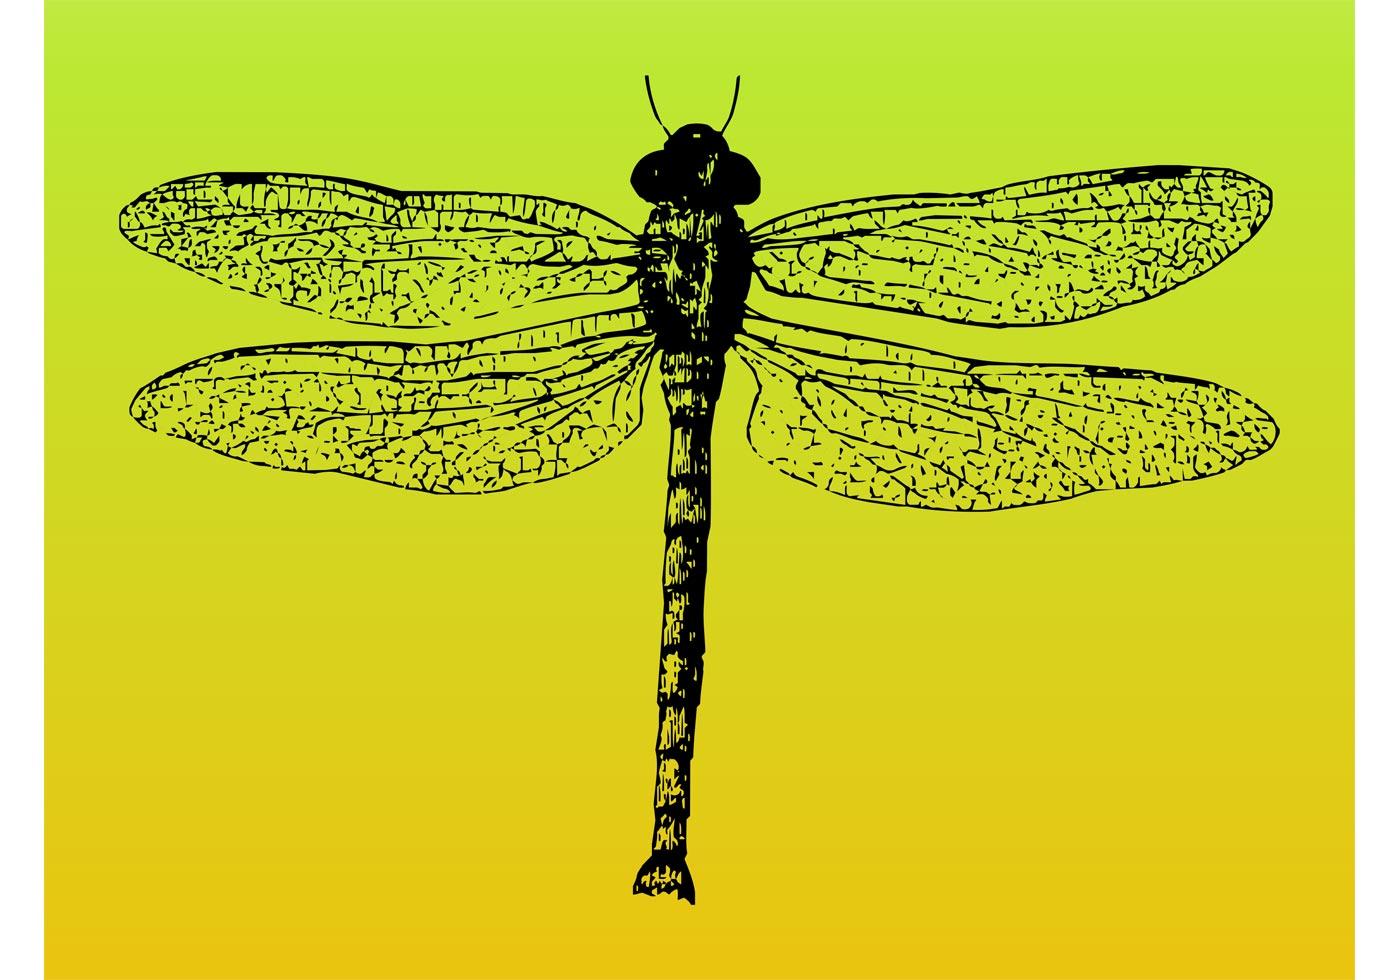 Dragonfly Vector - Download Free Vector Art, Stock ...